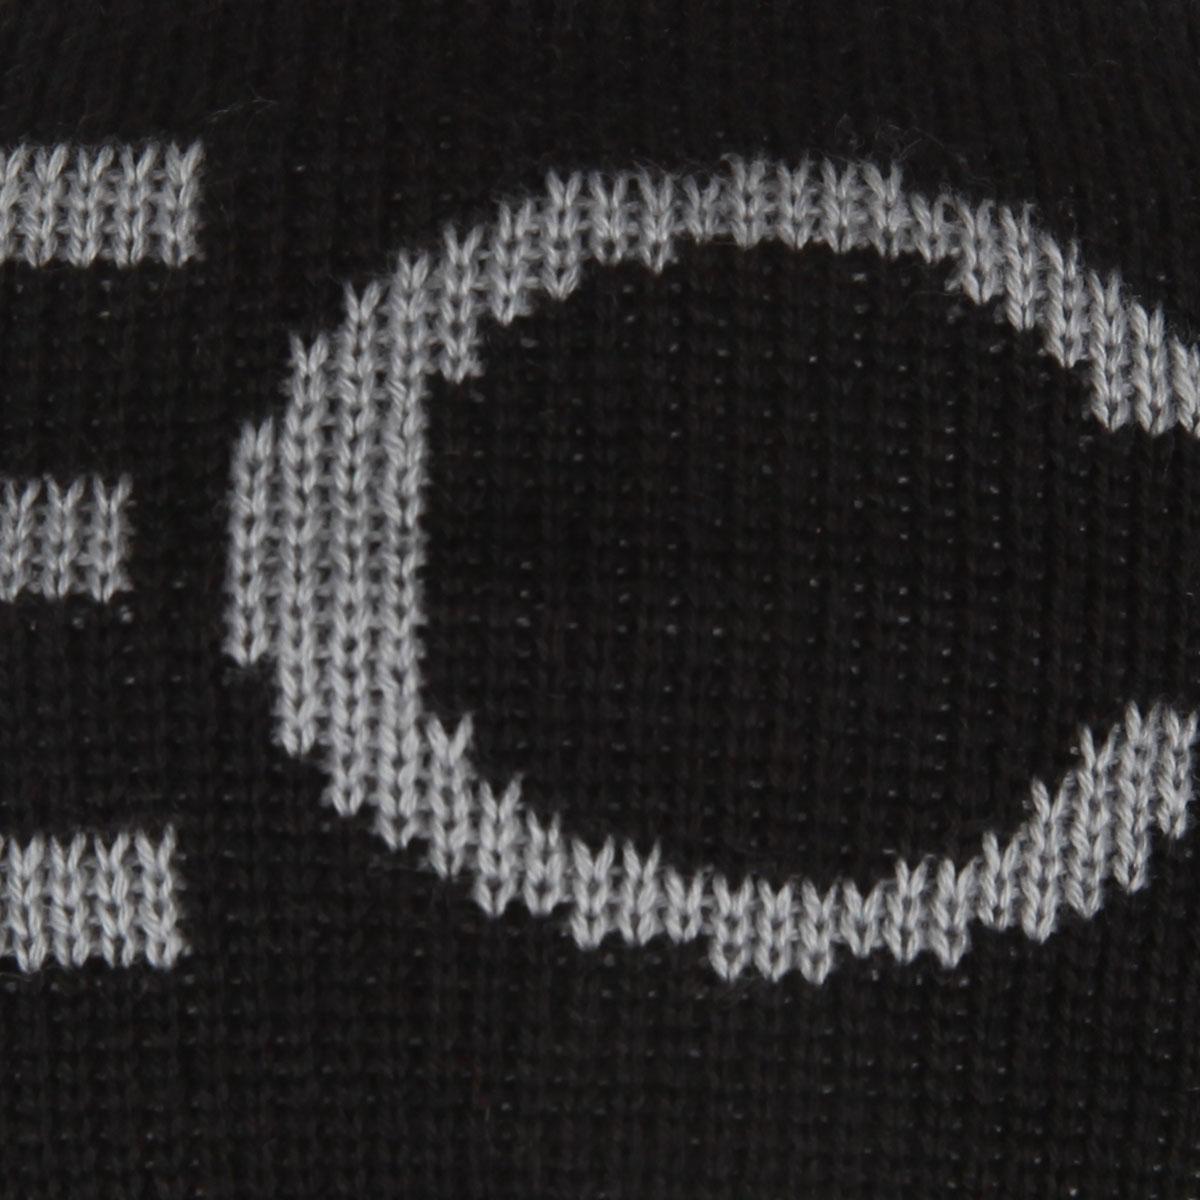 b9e9fe928 Купить повязку DC Skate Head Band Black (ADYHA03688-KVJ0) в интернет ...